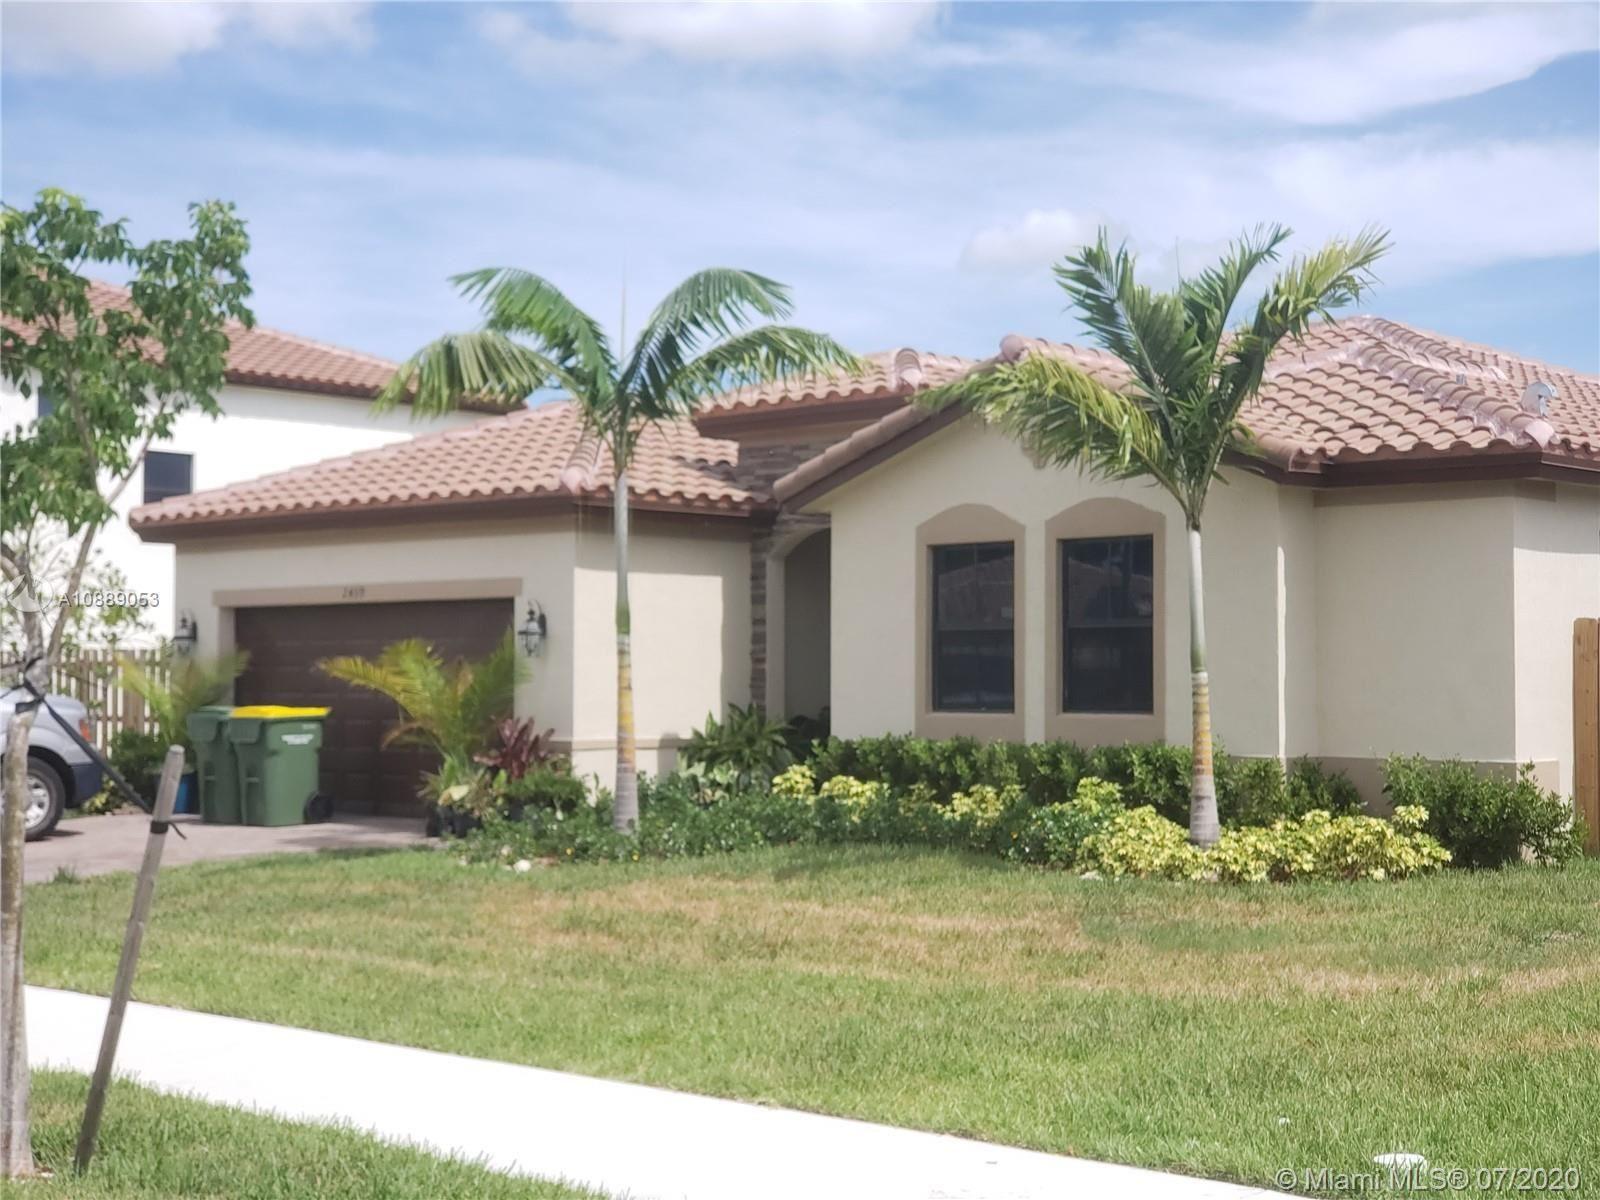 2439 SE 3rd St, Homestead, FL 33033 - #: A10889053